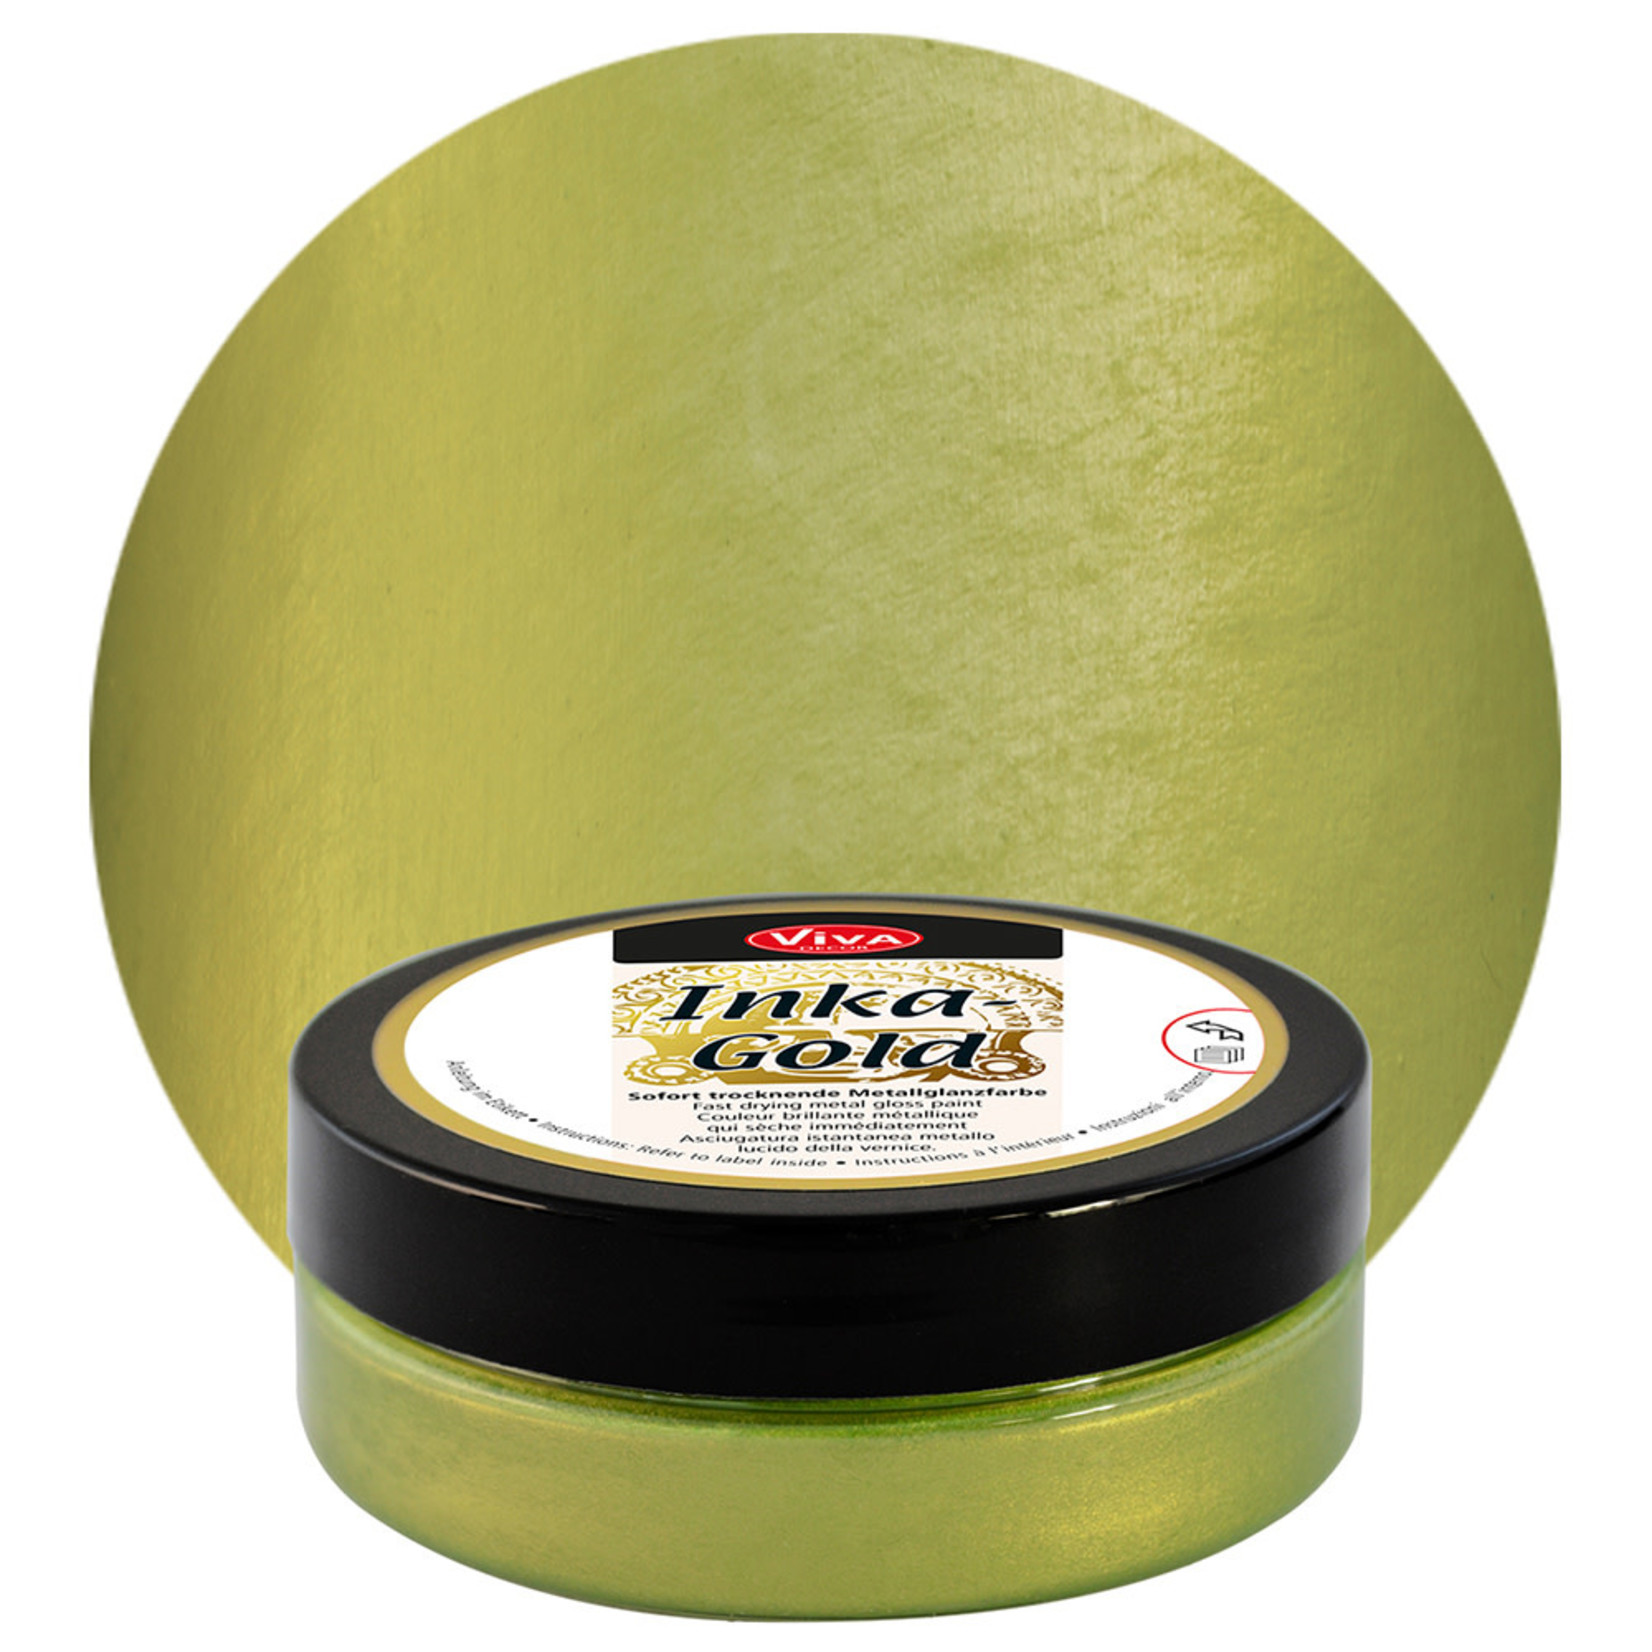 Viva Decor Inka Gold 62.5g - Green-Yellow